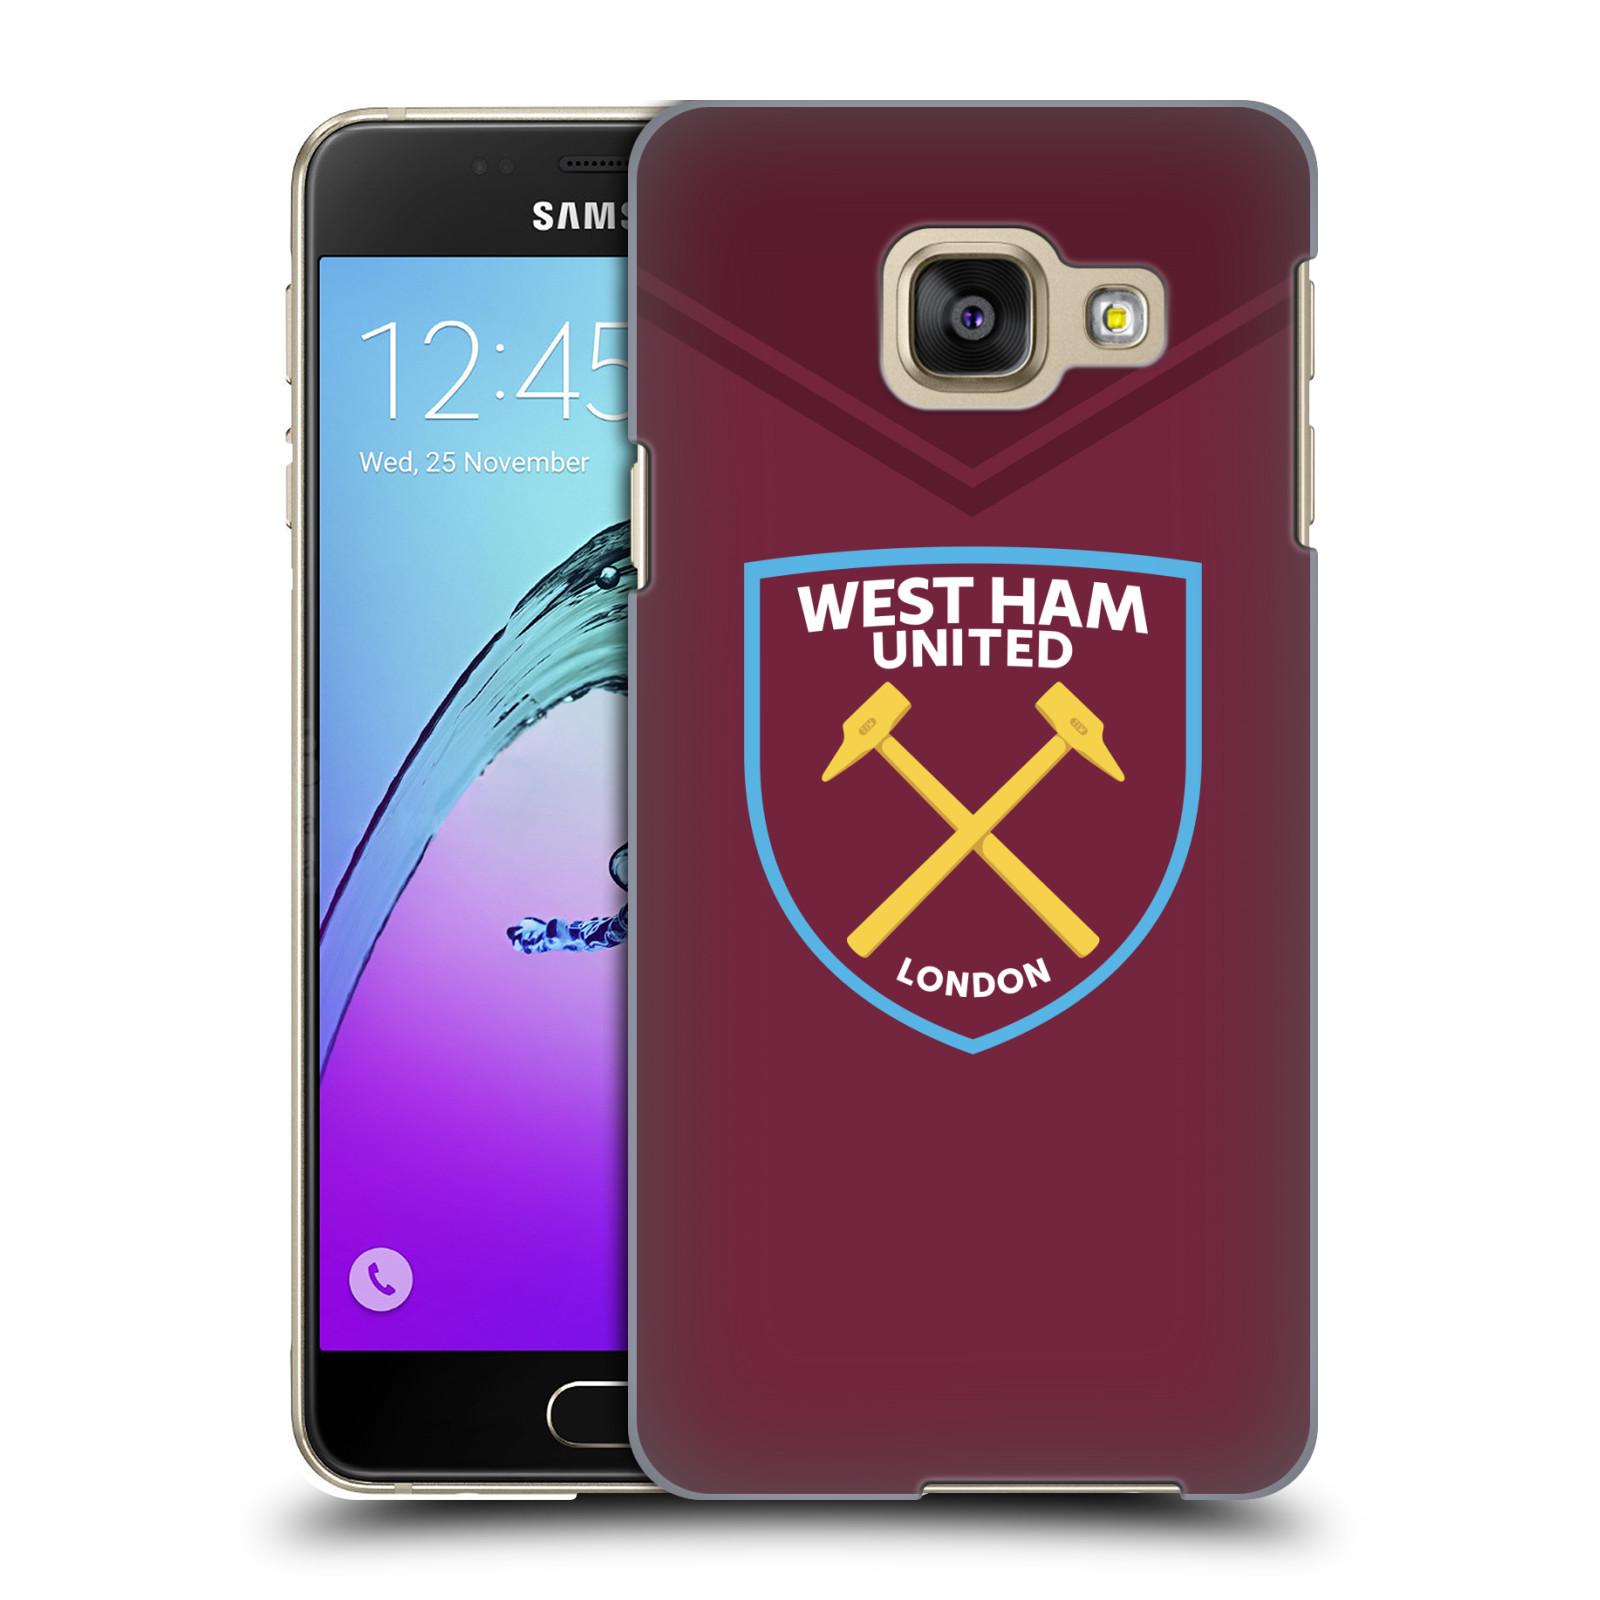 Plastové pouzdro na mobil Samsung Galaxy A3 (2016) - Head Case - West Ham United - Logo